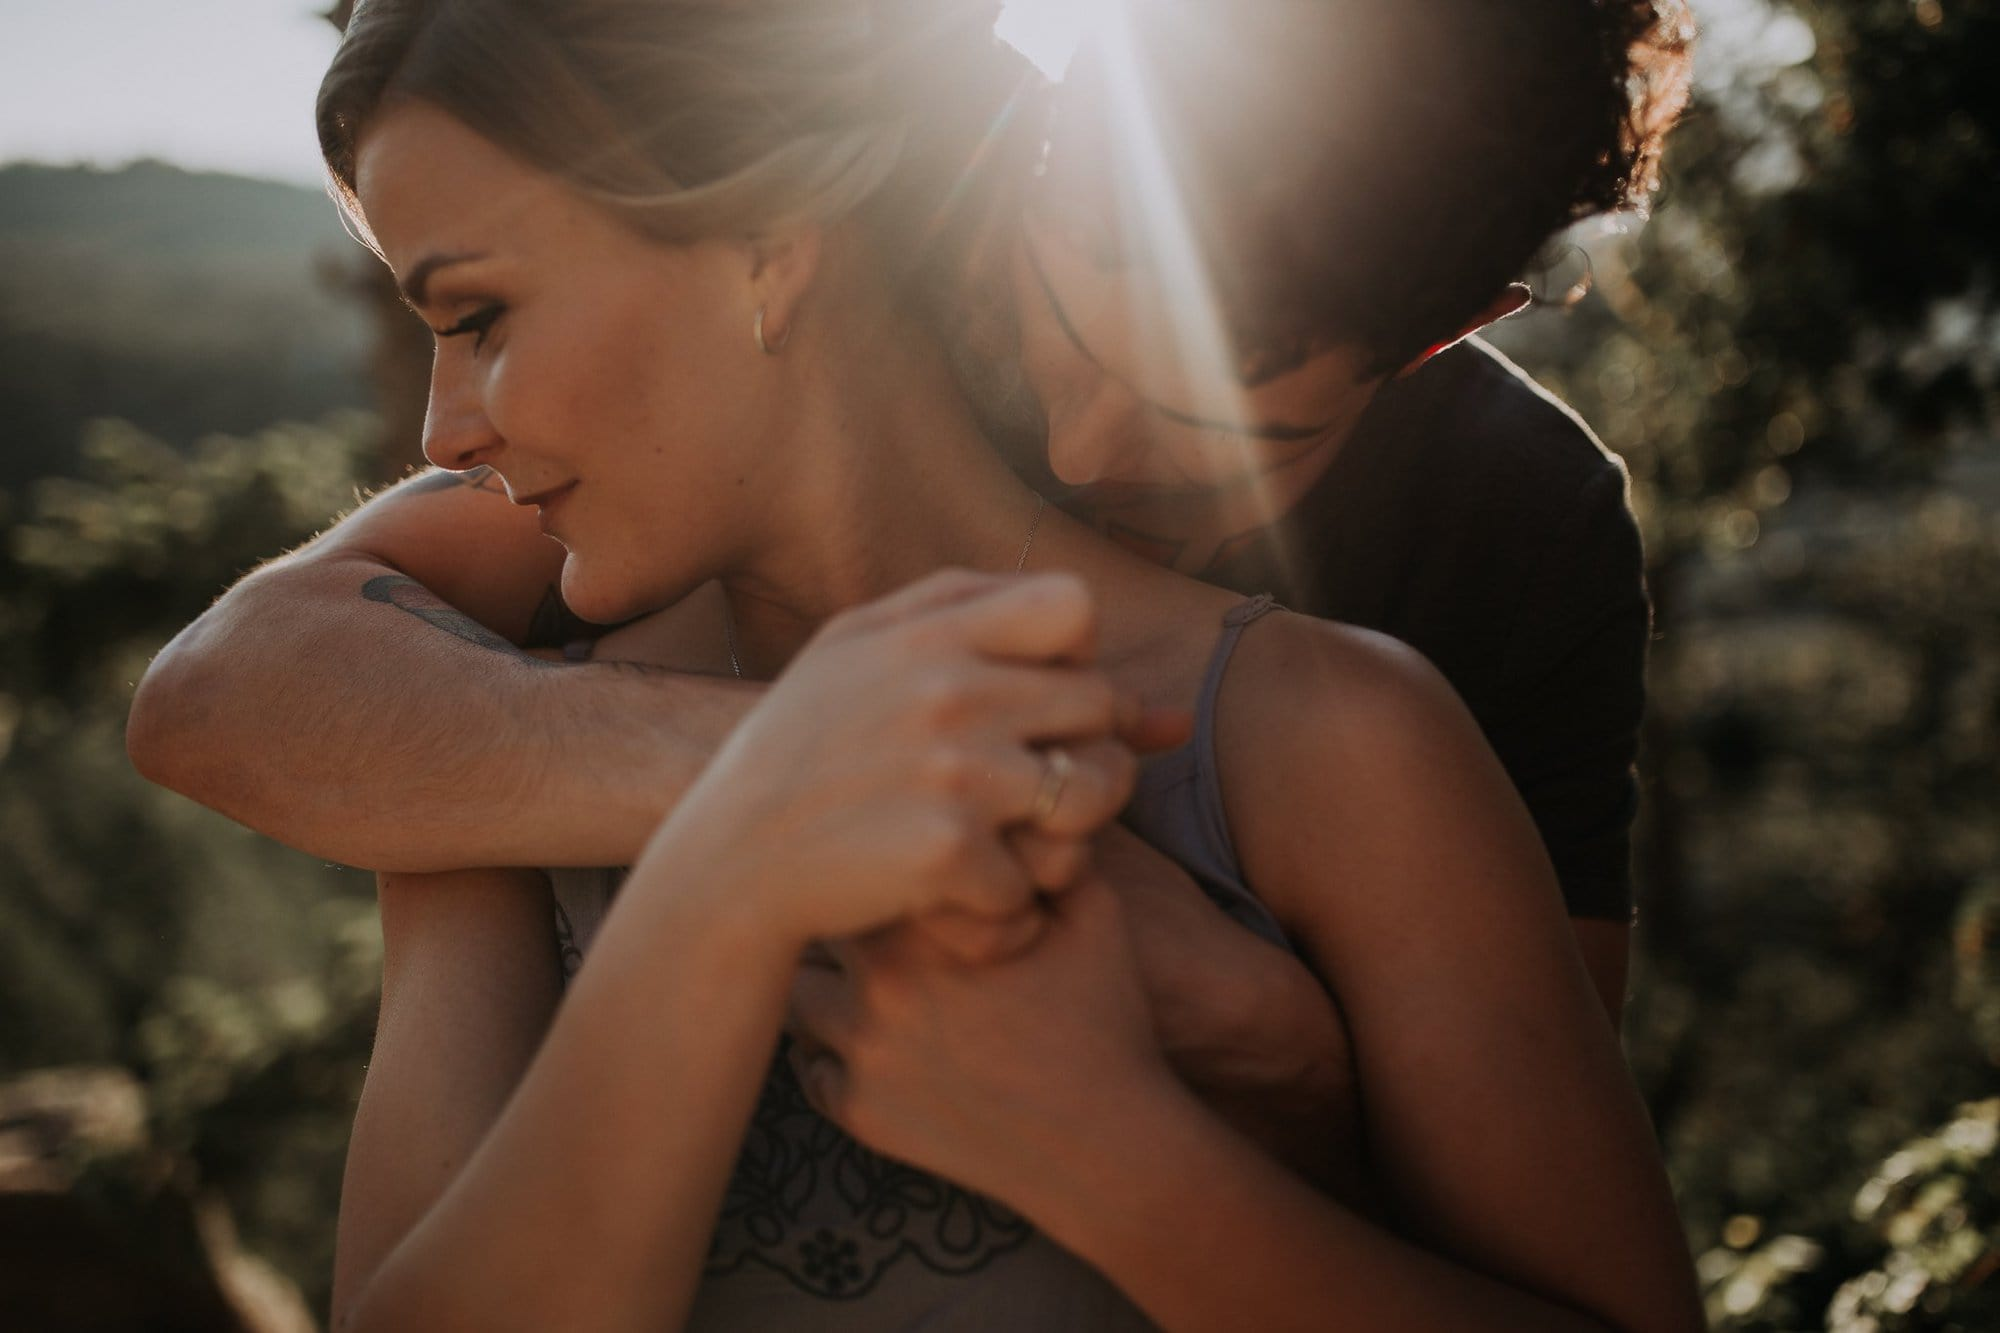 LOST GULCH OUTLOOK ENGAGEMENTPHOTOS| ALICIA + ELIAS|JUSTYNA E BUTLER PHOTOGRAPHY | BOULDER, COLORADOWEDDINGPHOTOGRAPHER